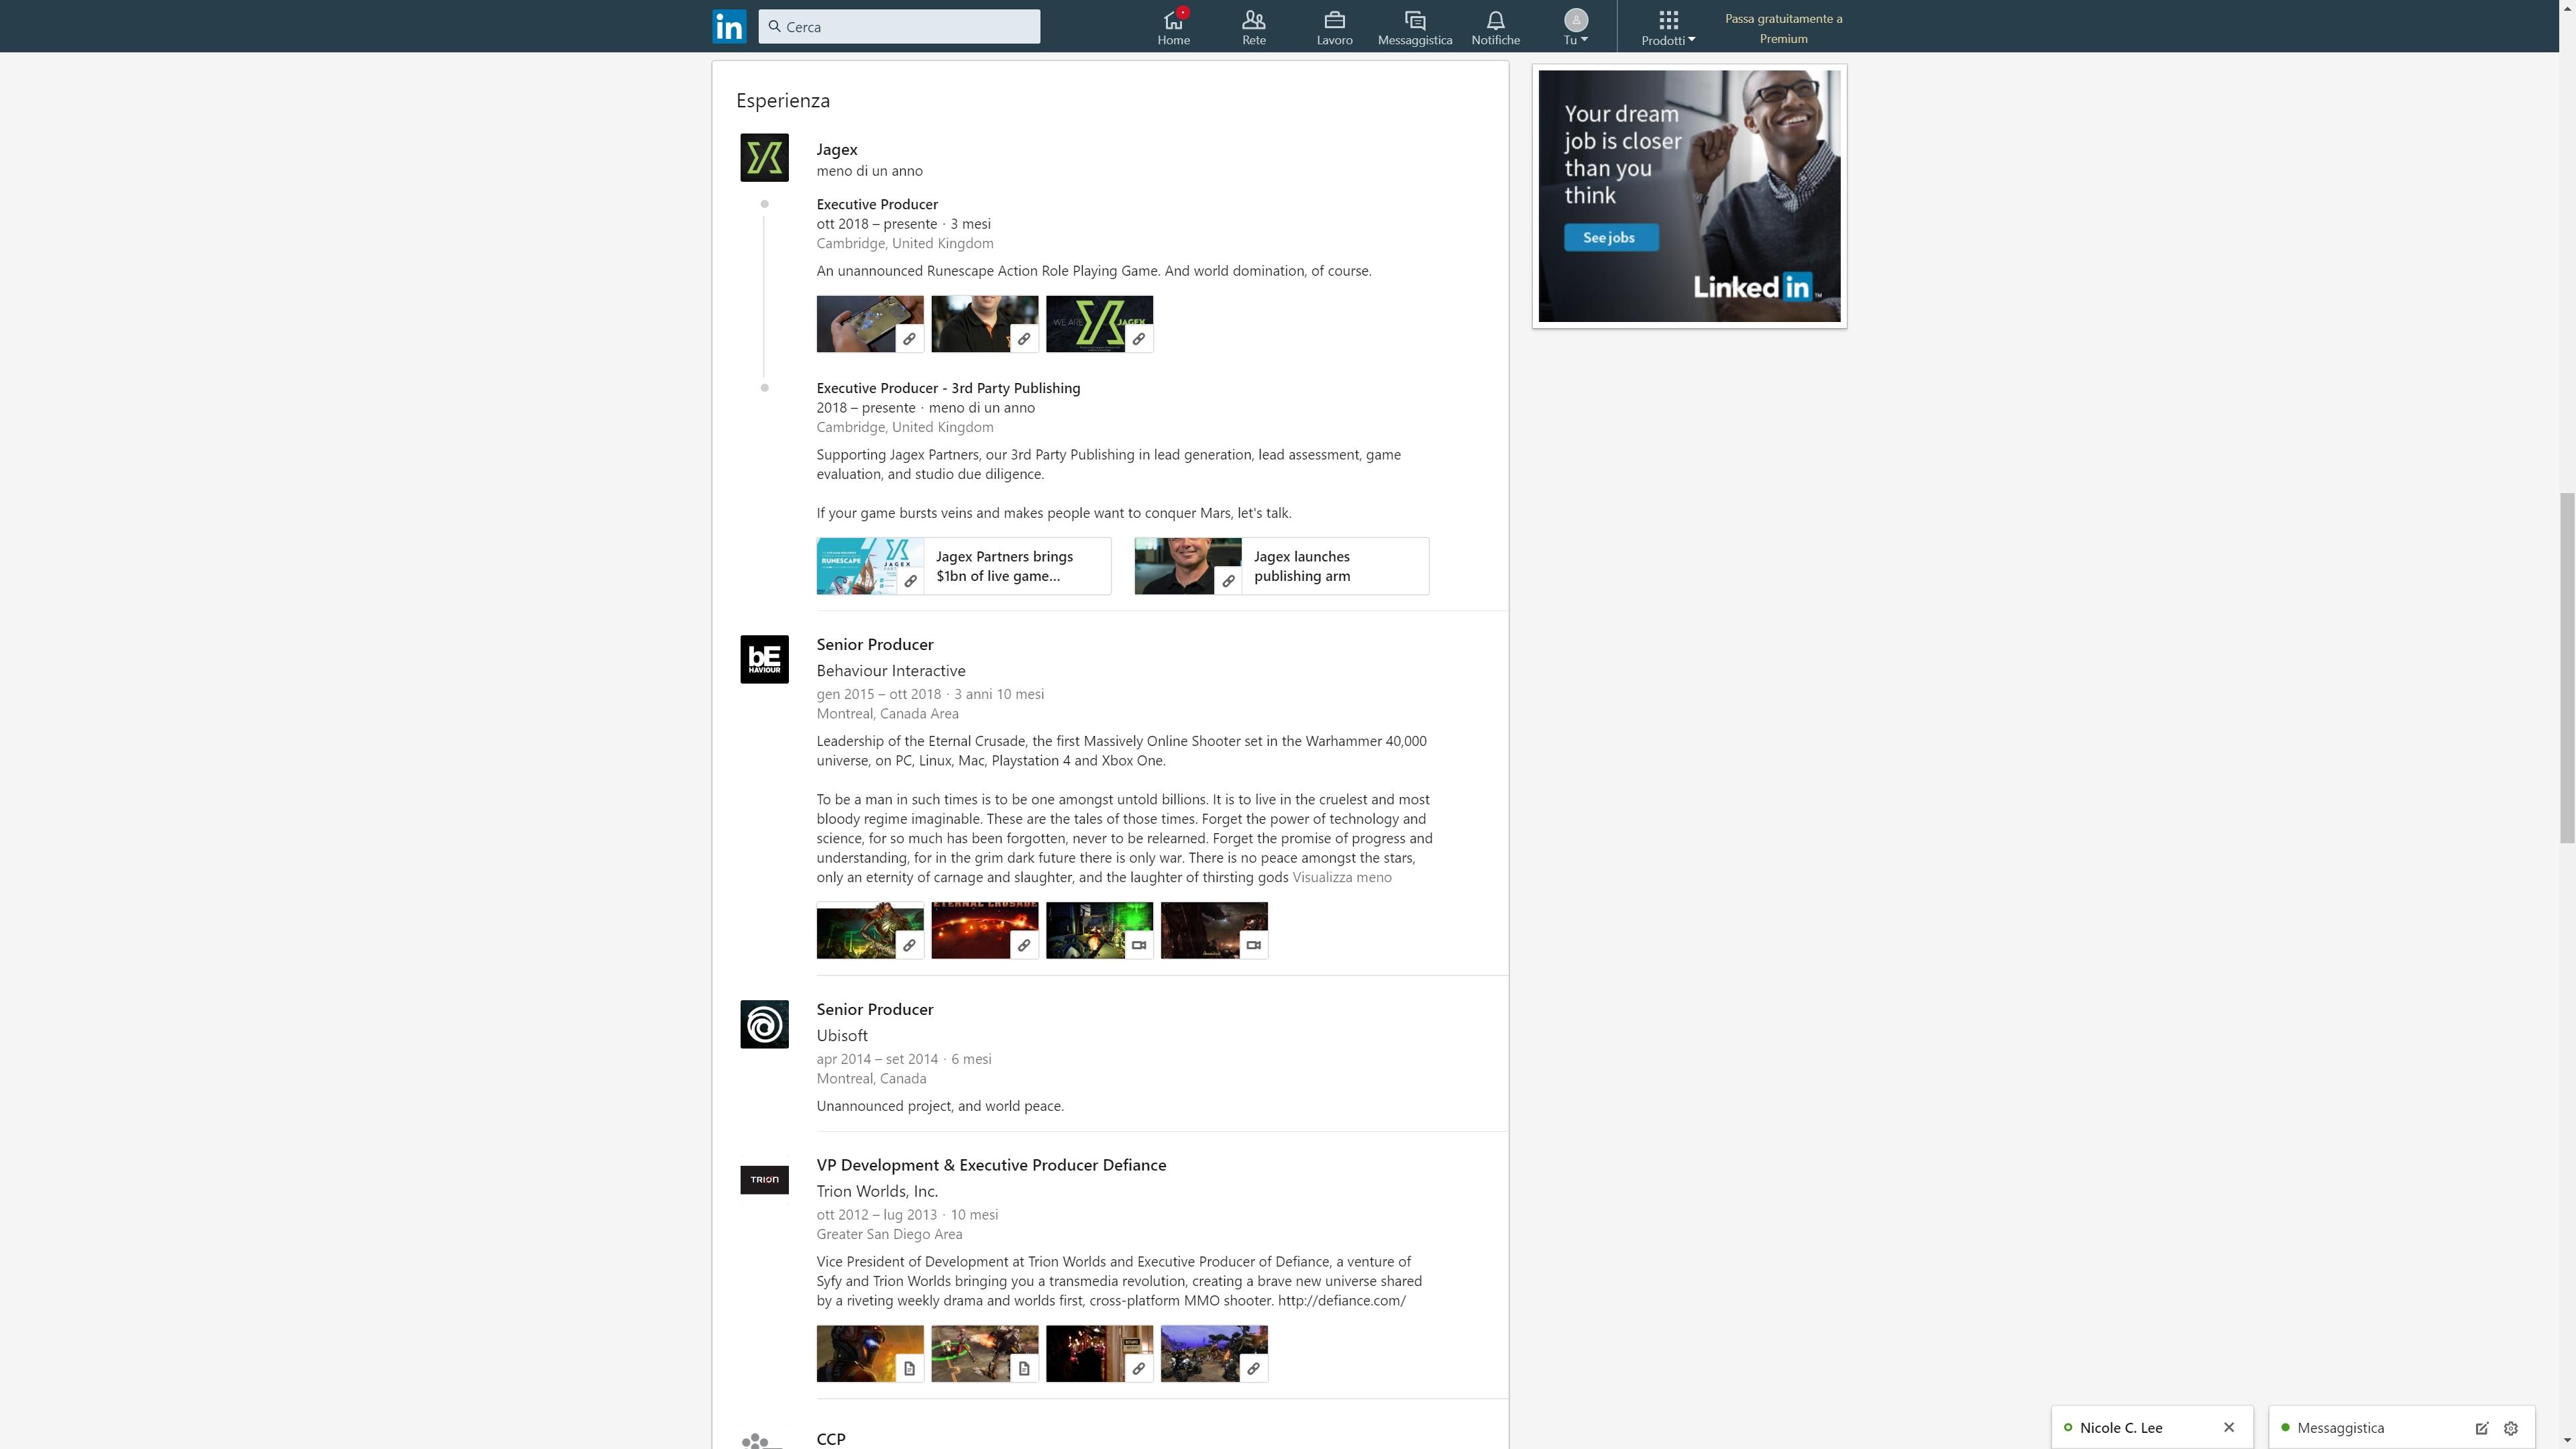 LinkedIn RuneScape